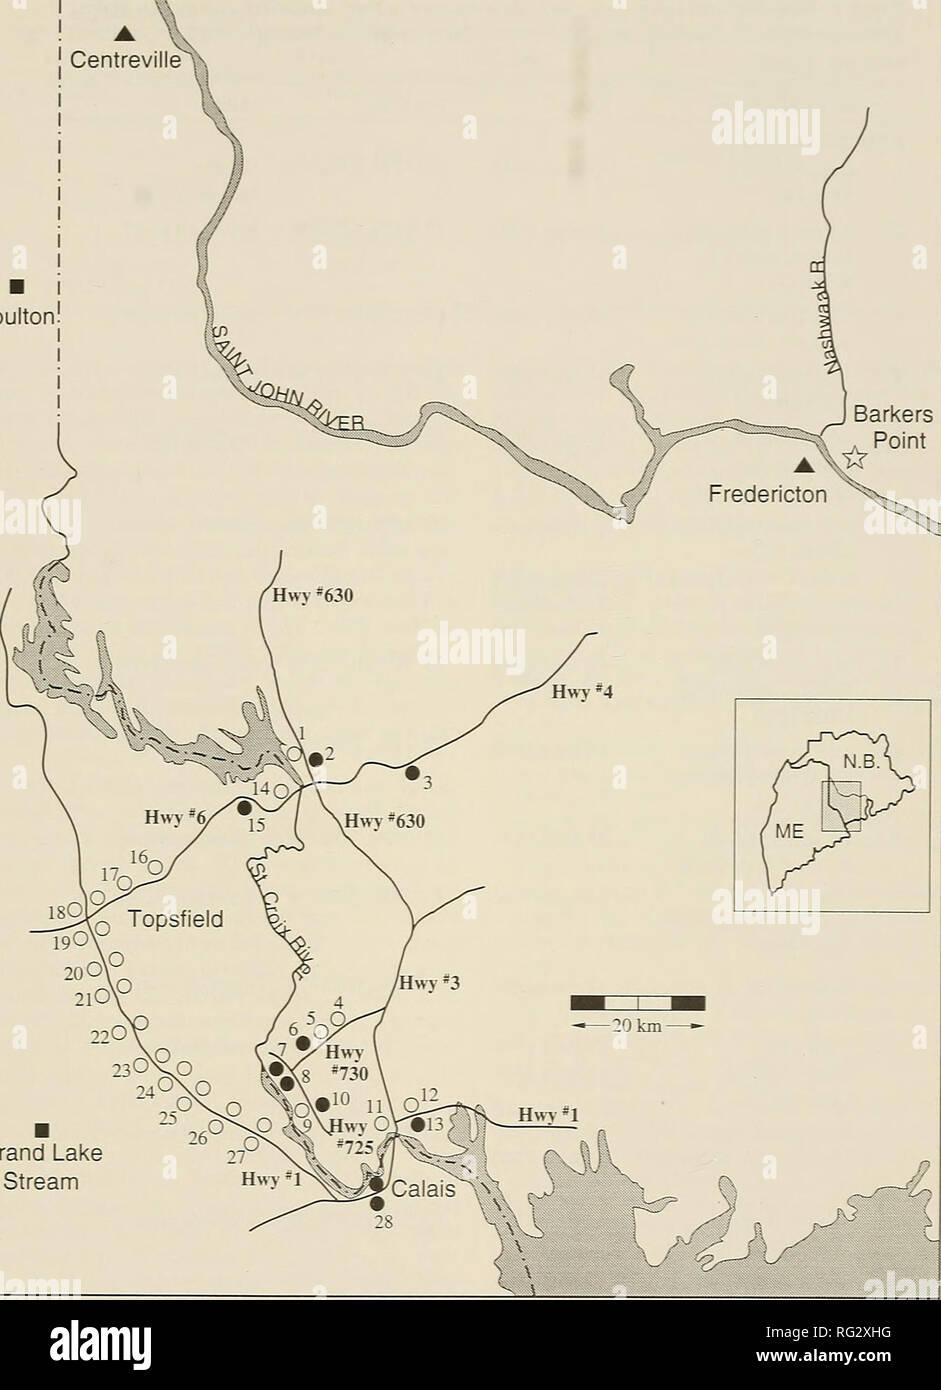 Grand Lake Stream Maine Map.The Canadian Field Naturalist 1991 Mcalpine Fletcher Gorham And